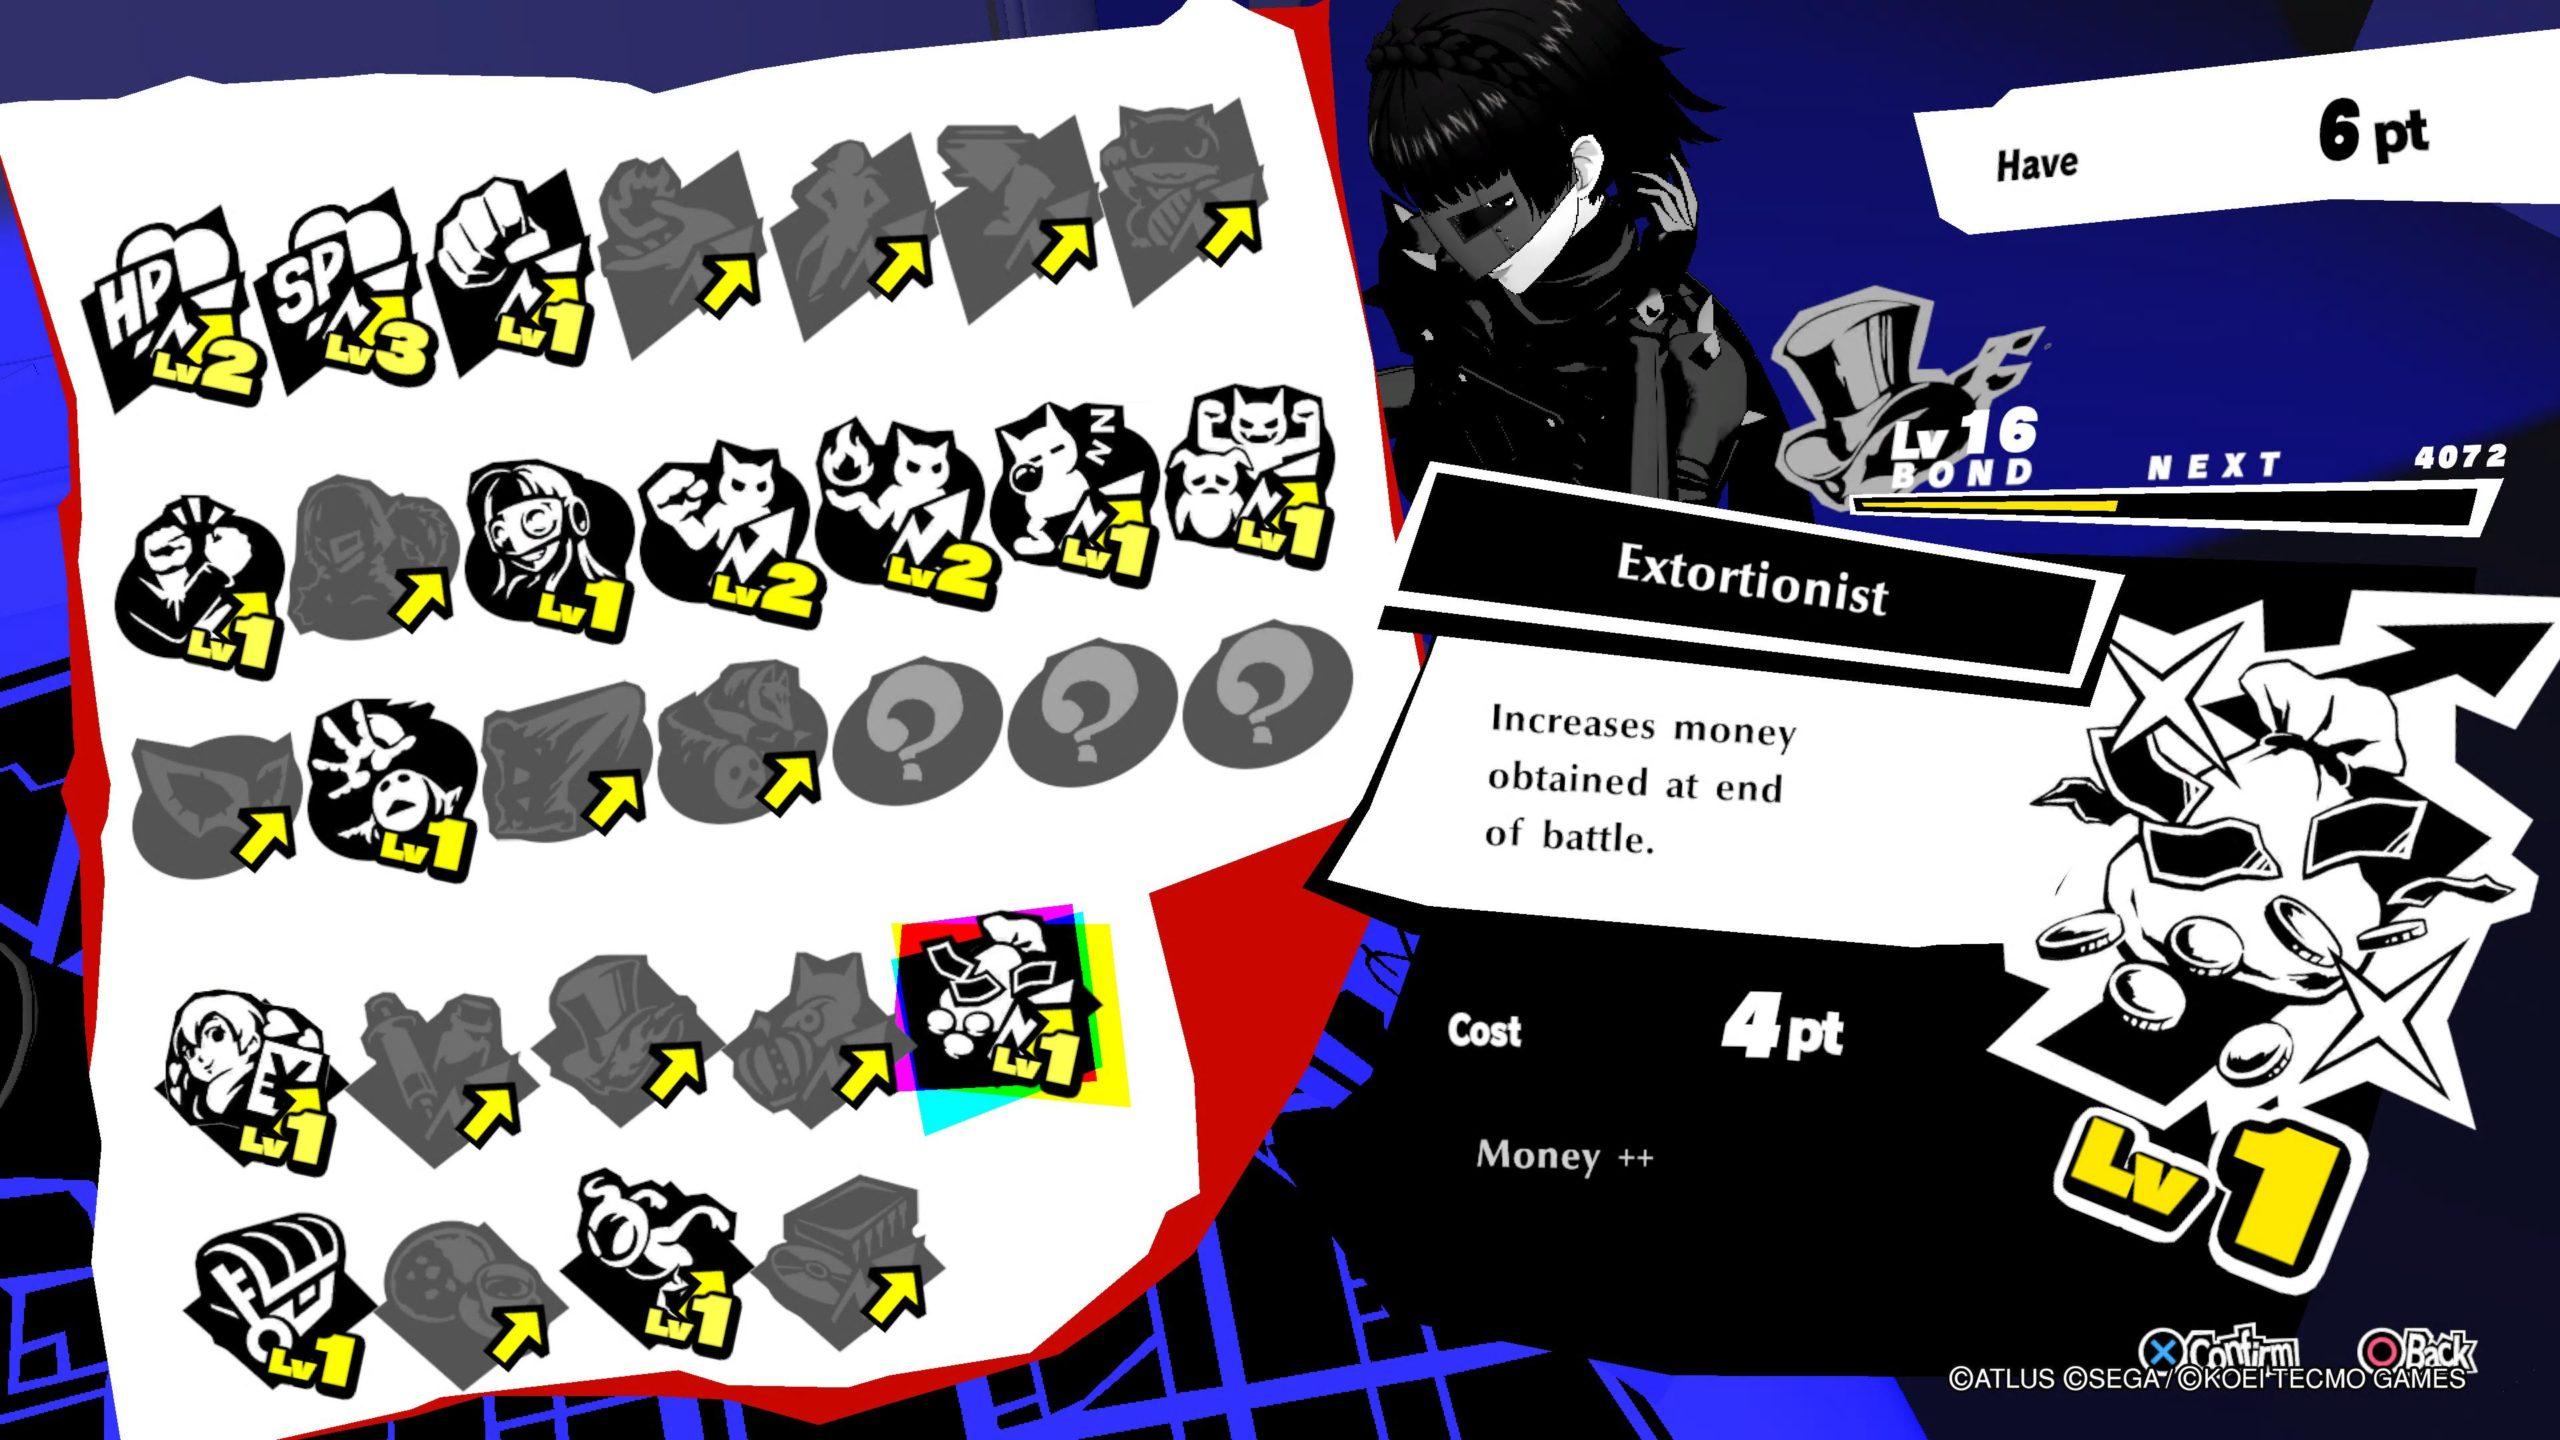 Persona 5 Strikers Extortionist Bond